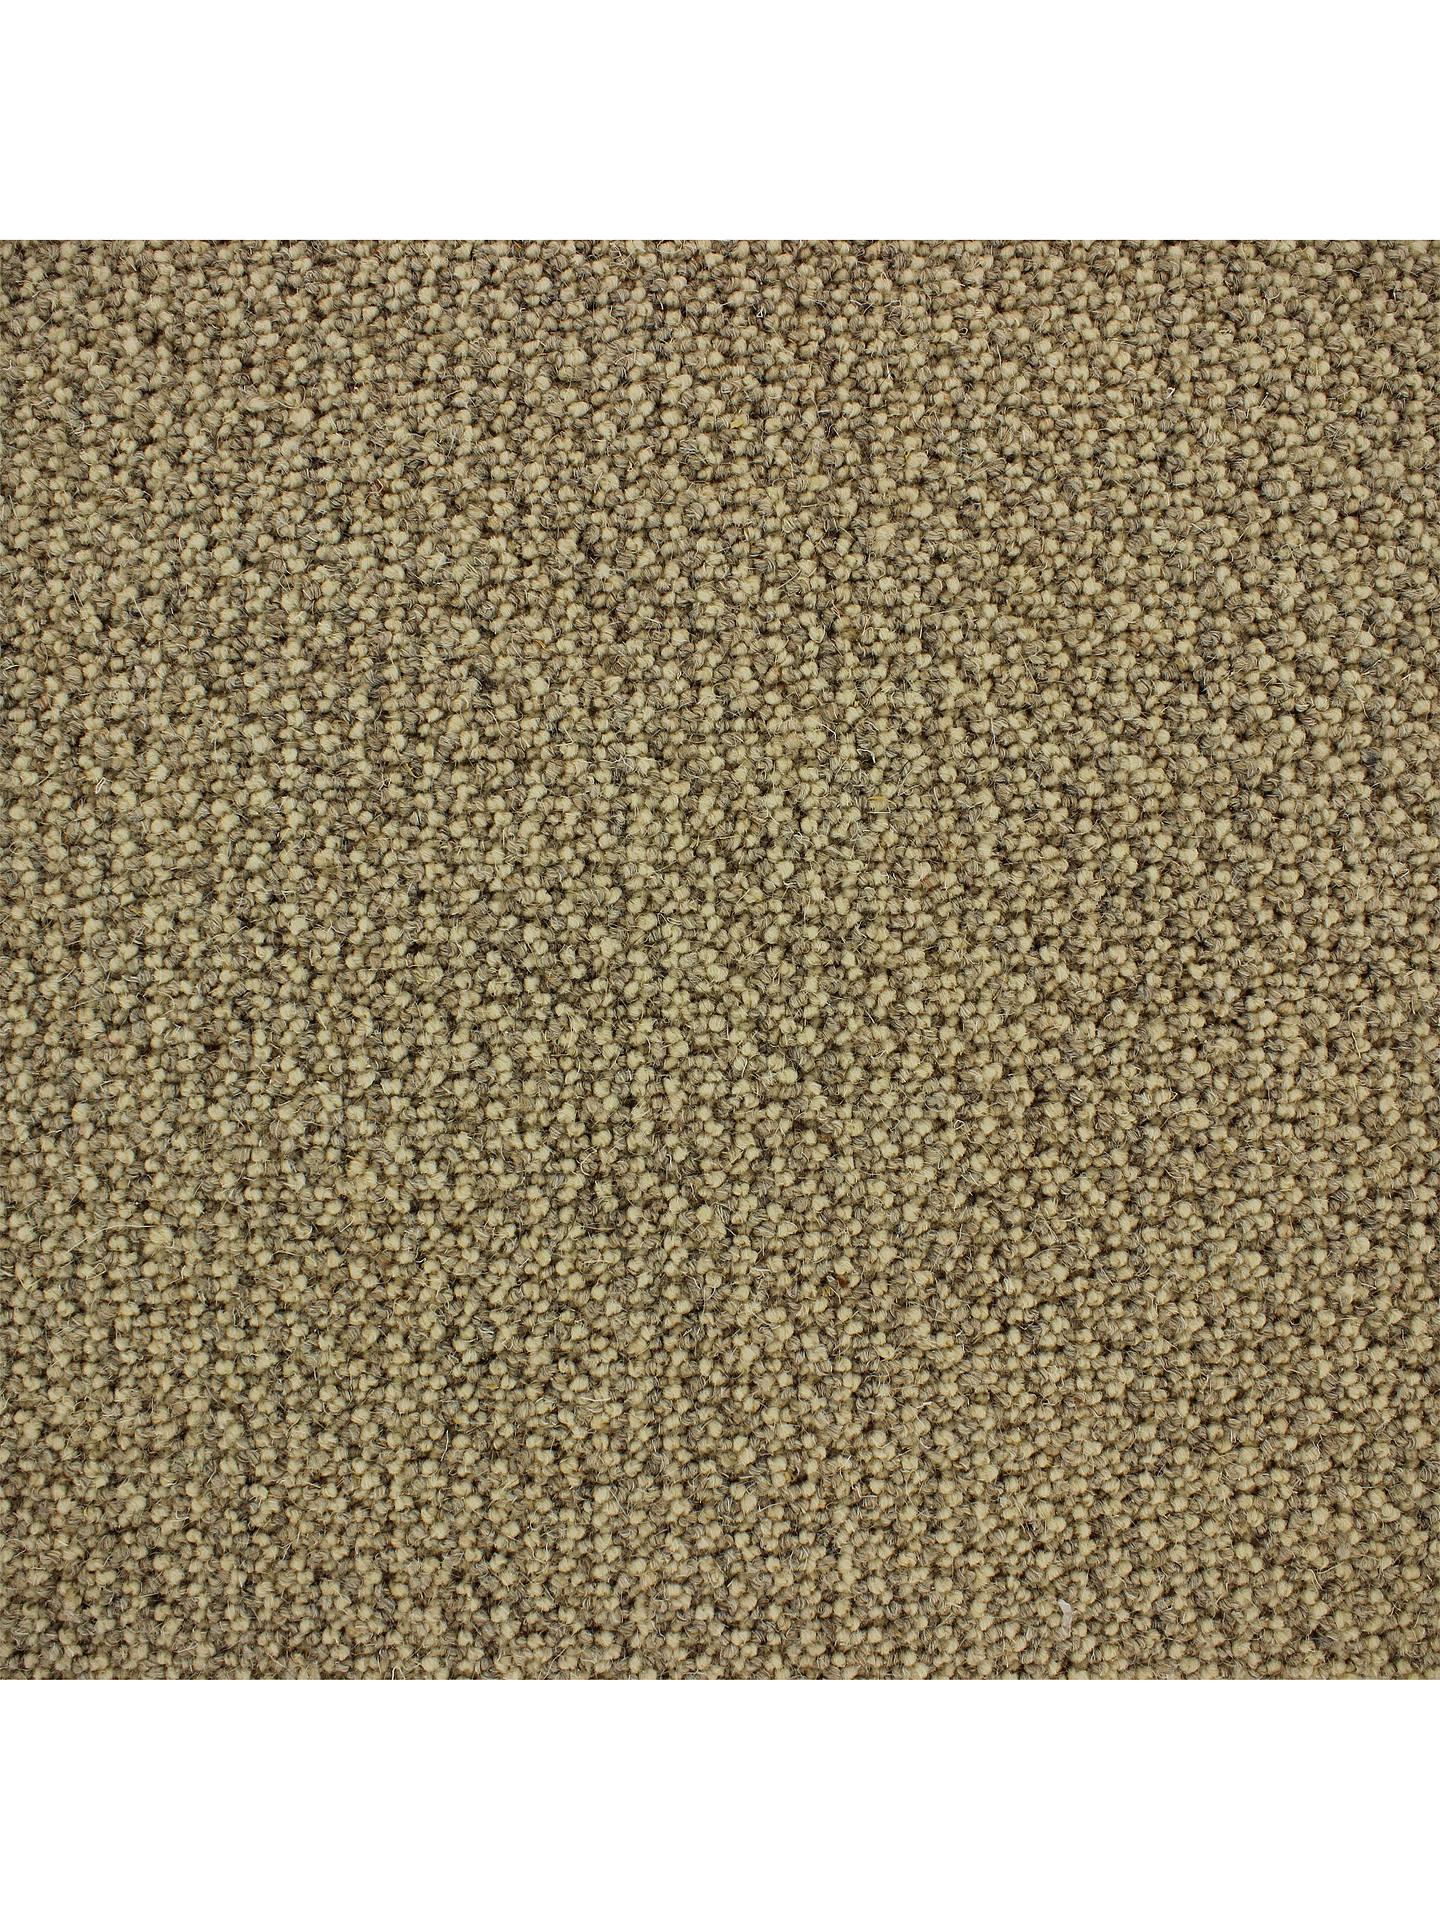 john lewis partners panache carpet at john lewis partners. Black Bedroom Furniture Sets. Home Design Ideas